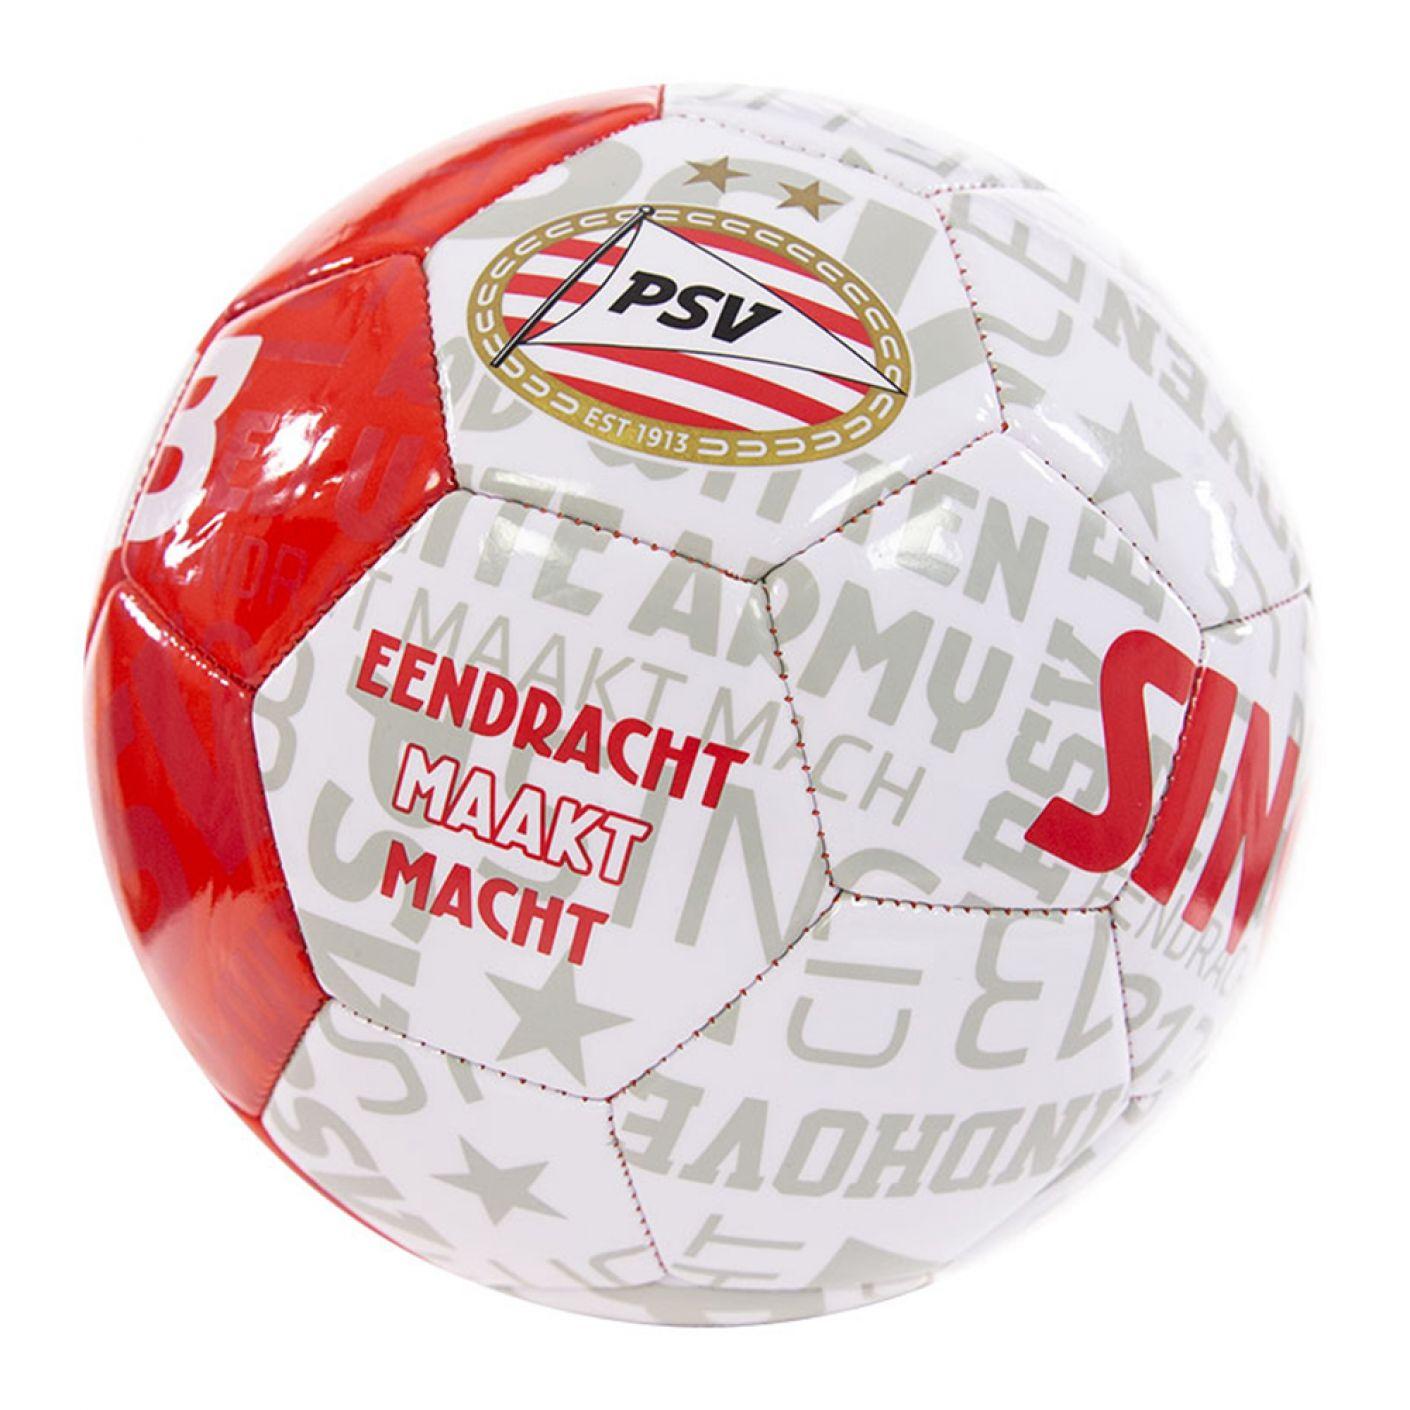 PSV Bal Teksten rood-wit